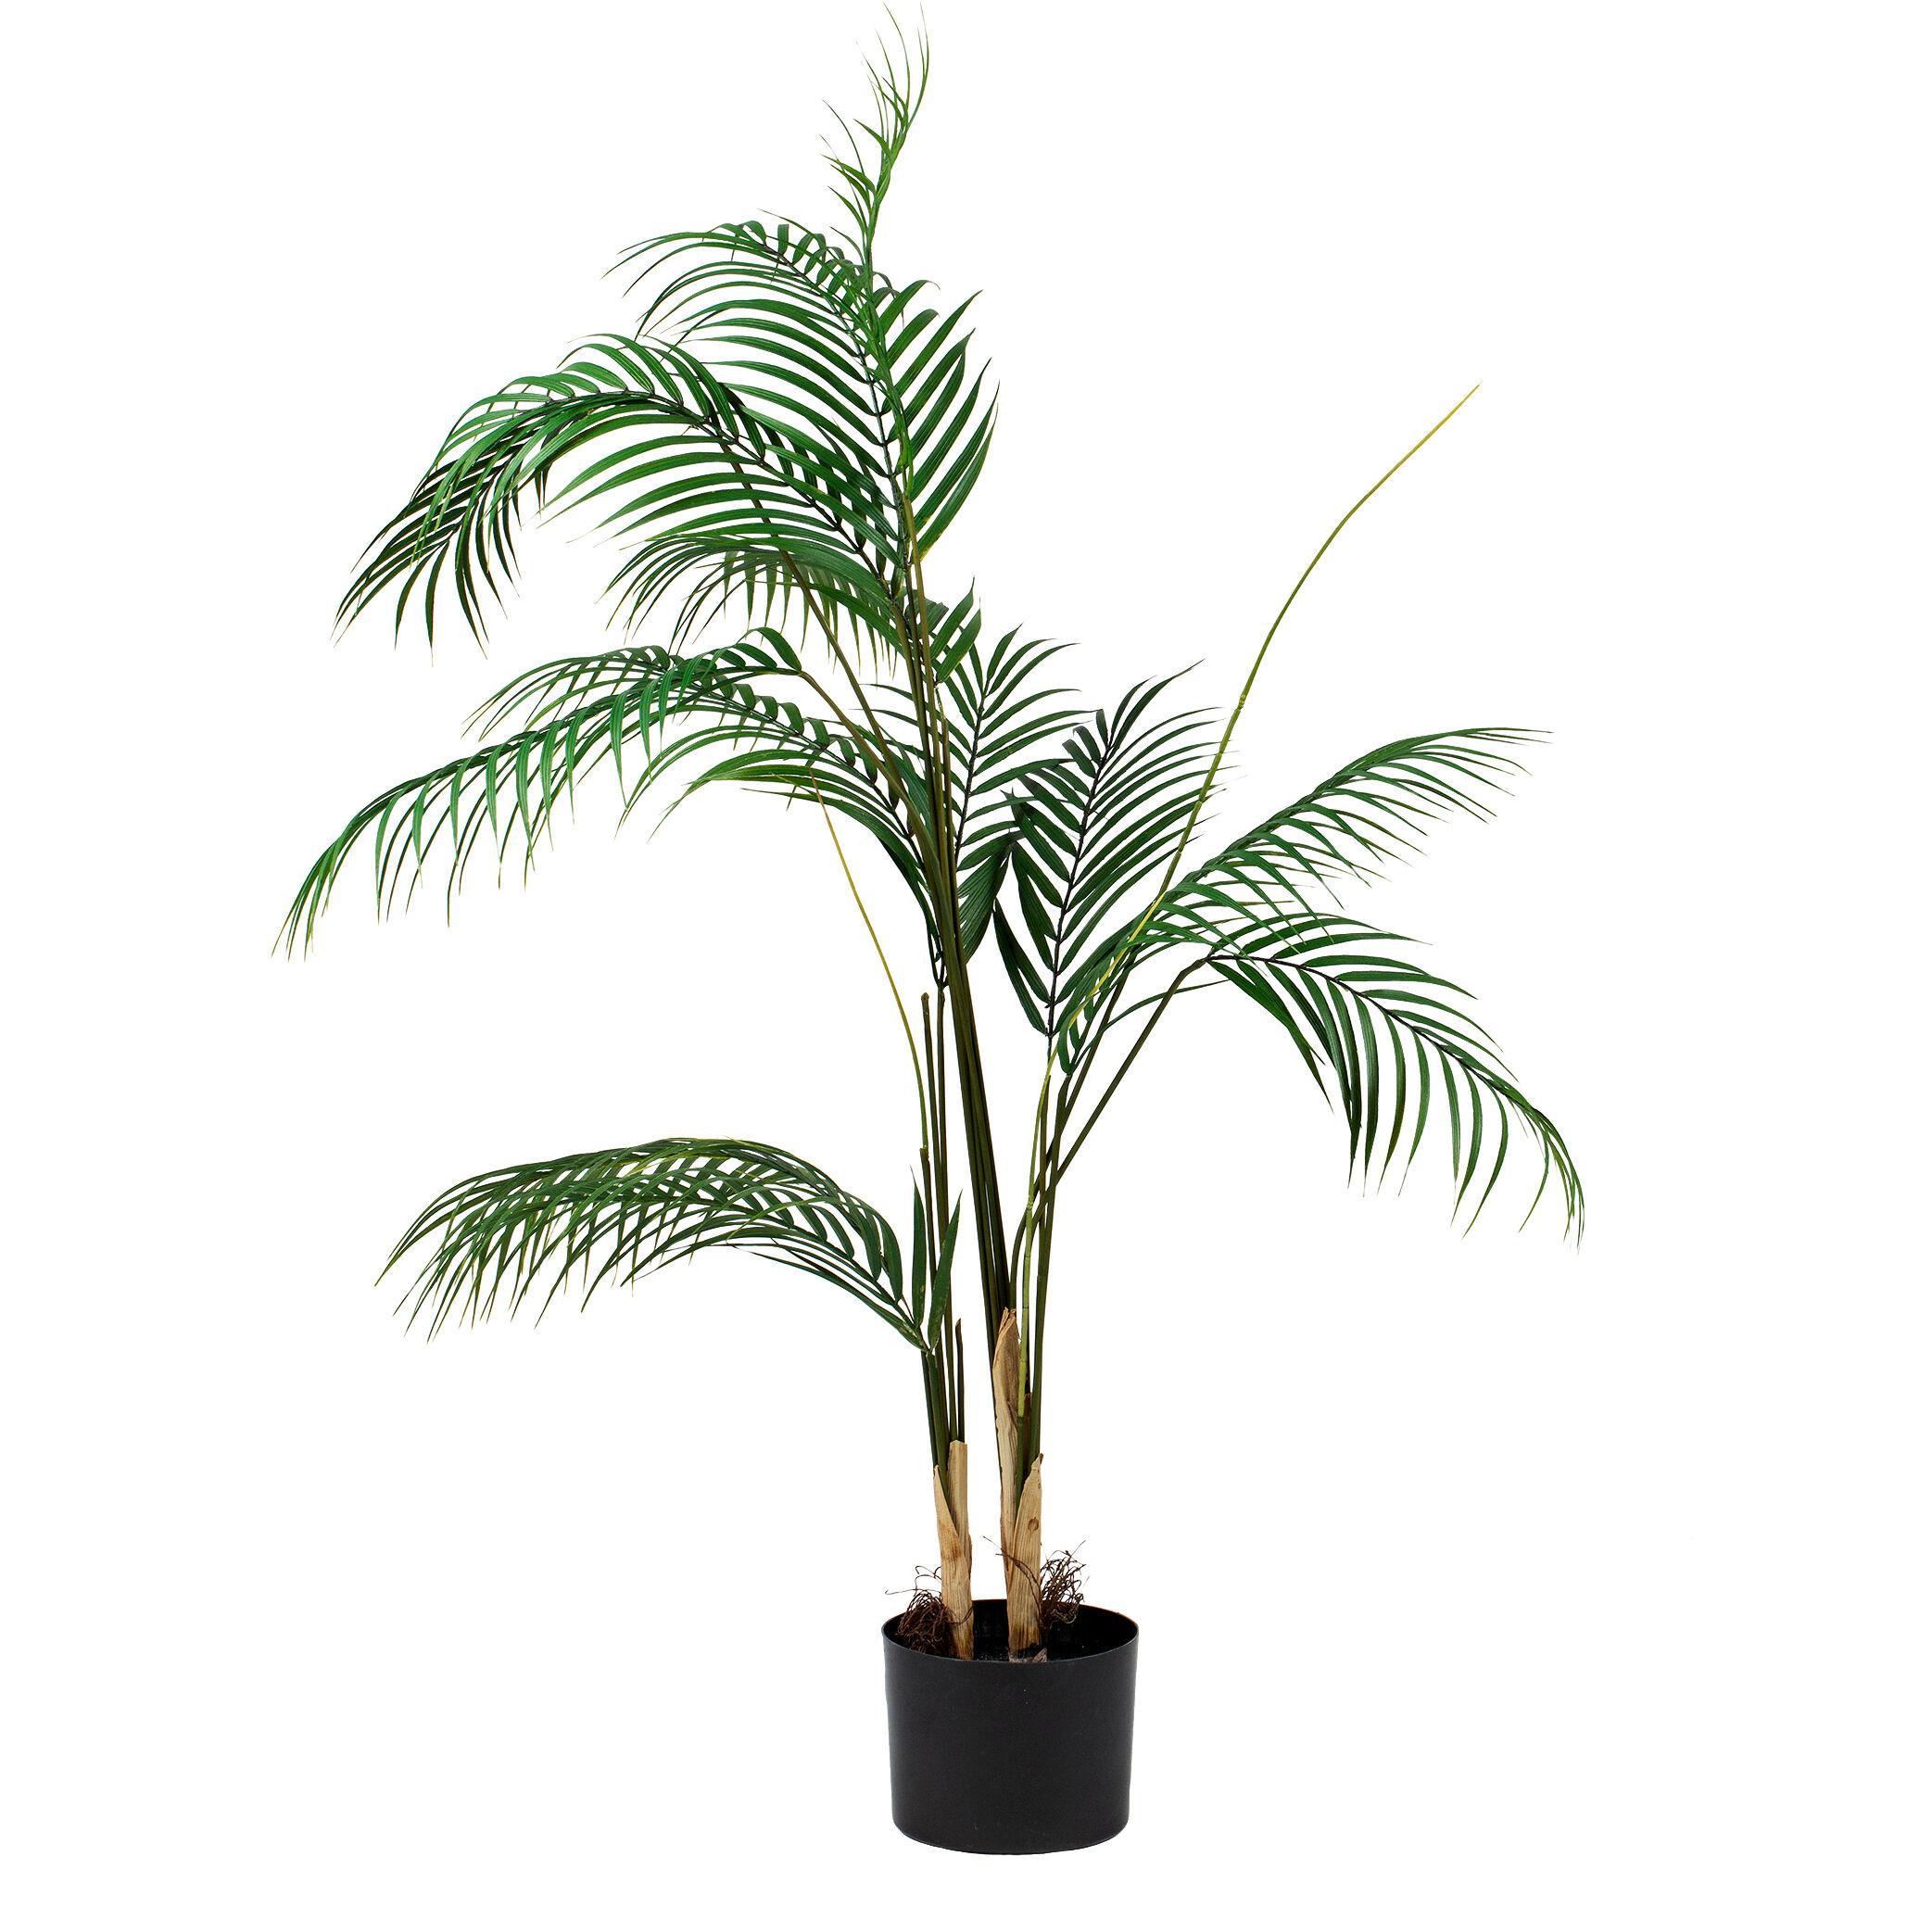 Standard produsent Plante Palme stor